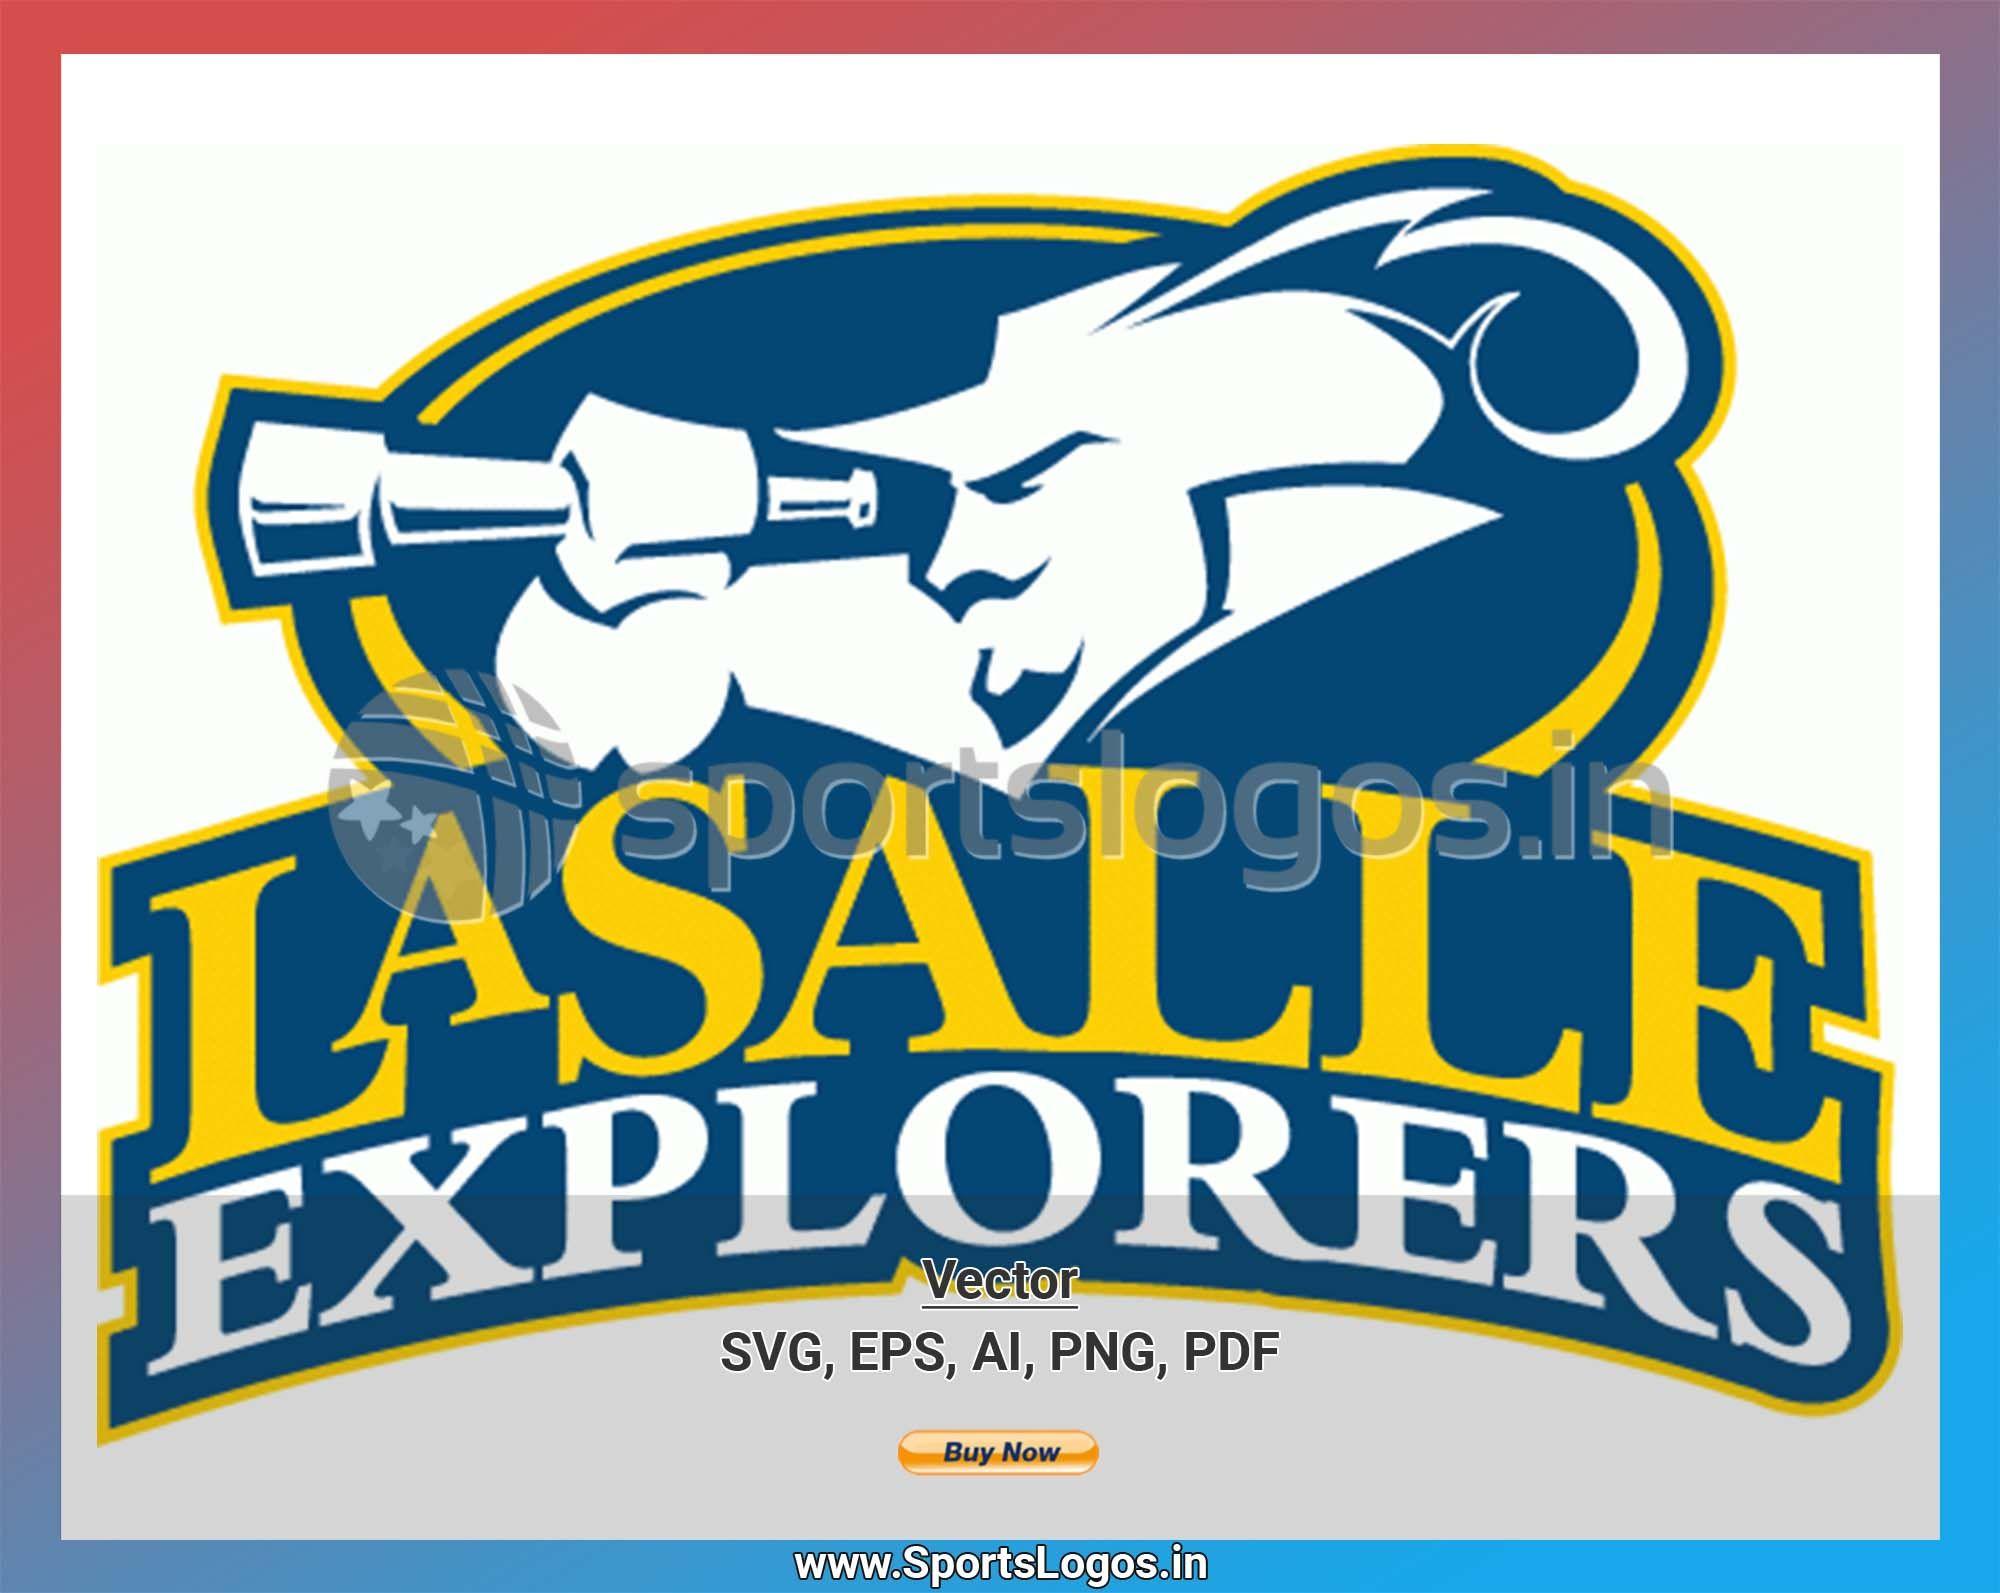 La Salle Explorers College Sports Vector Svg Logo In 5 Formats Spln002258 In 2020 College Sports Sports Logo Logo Evolution